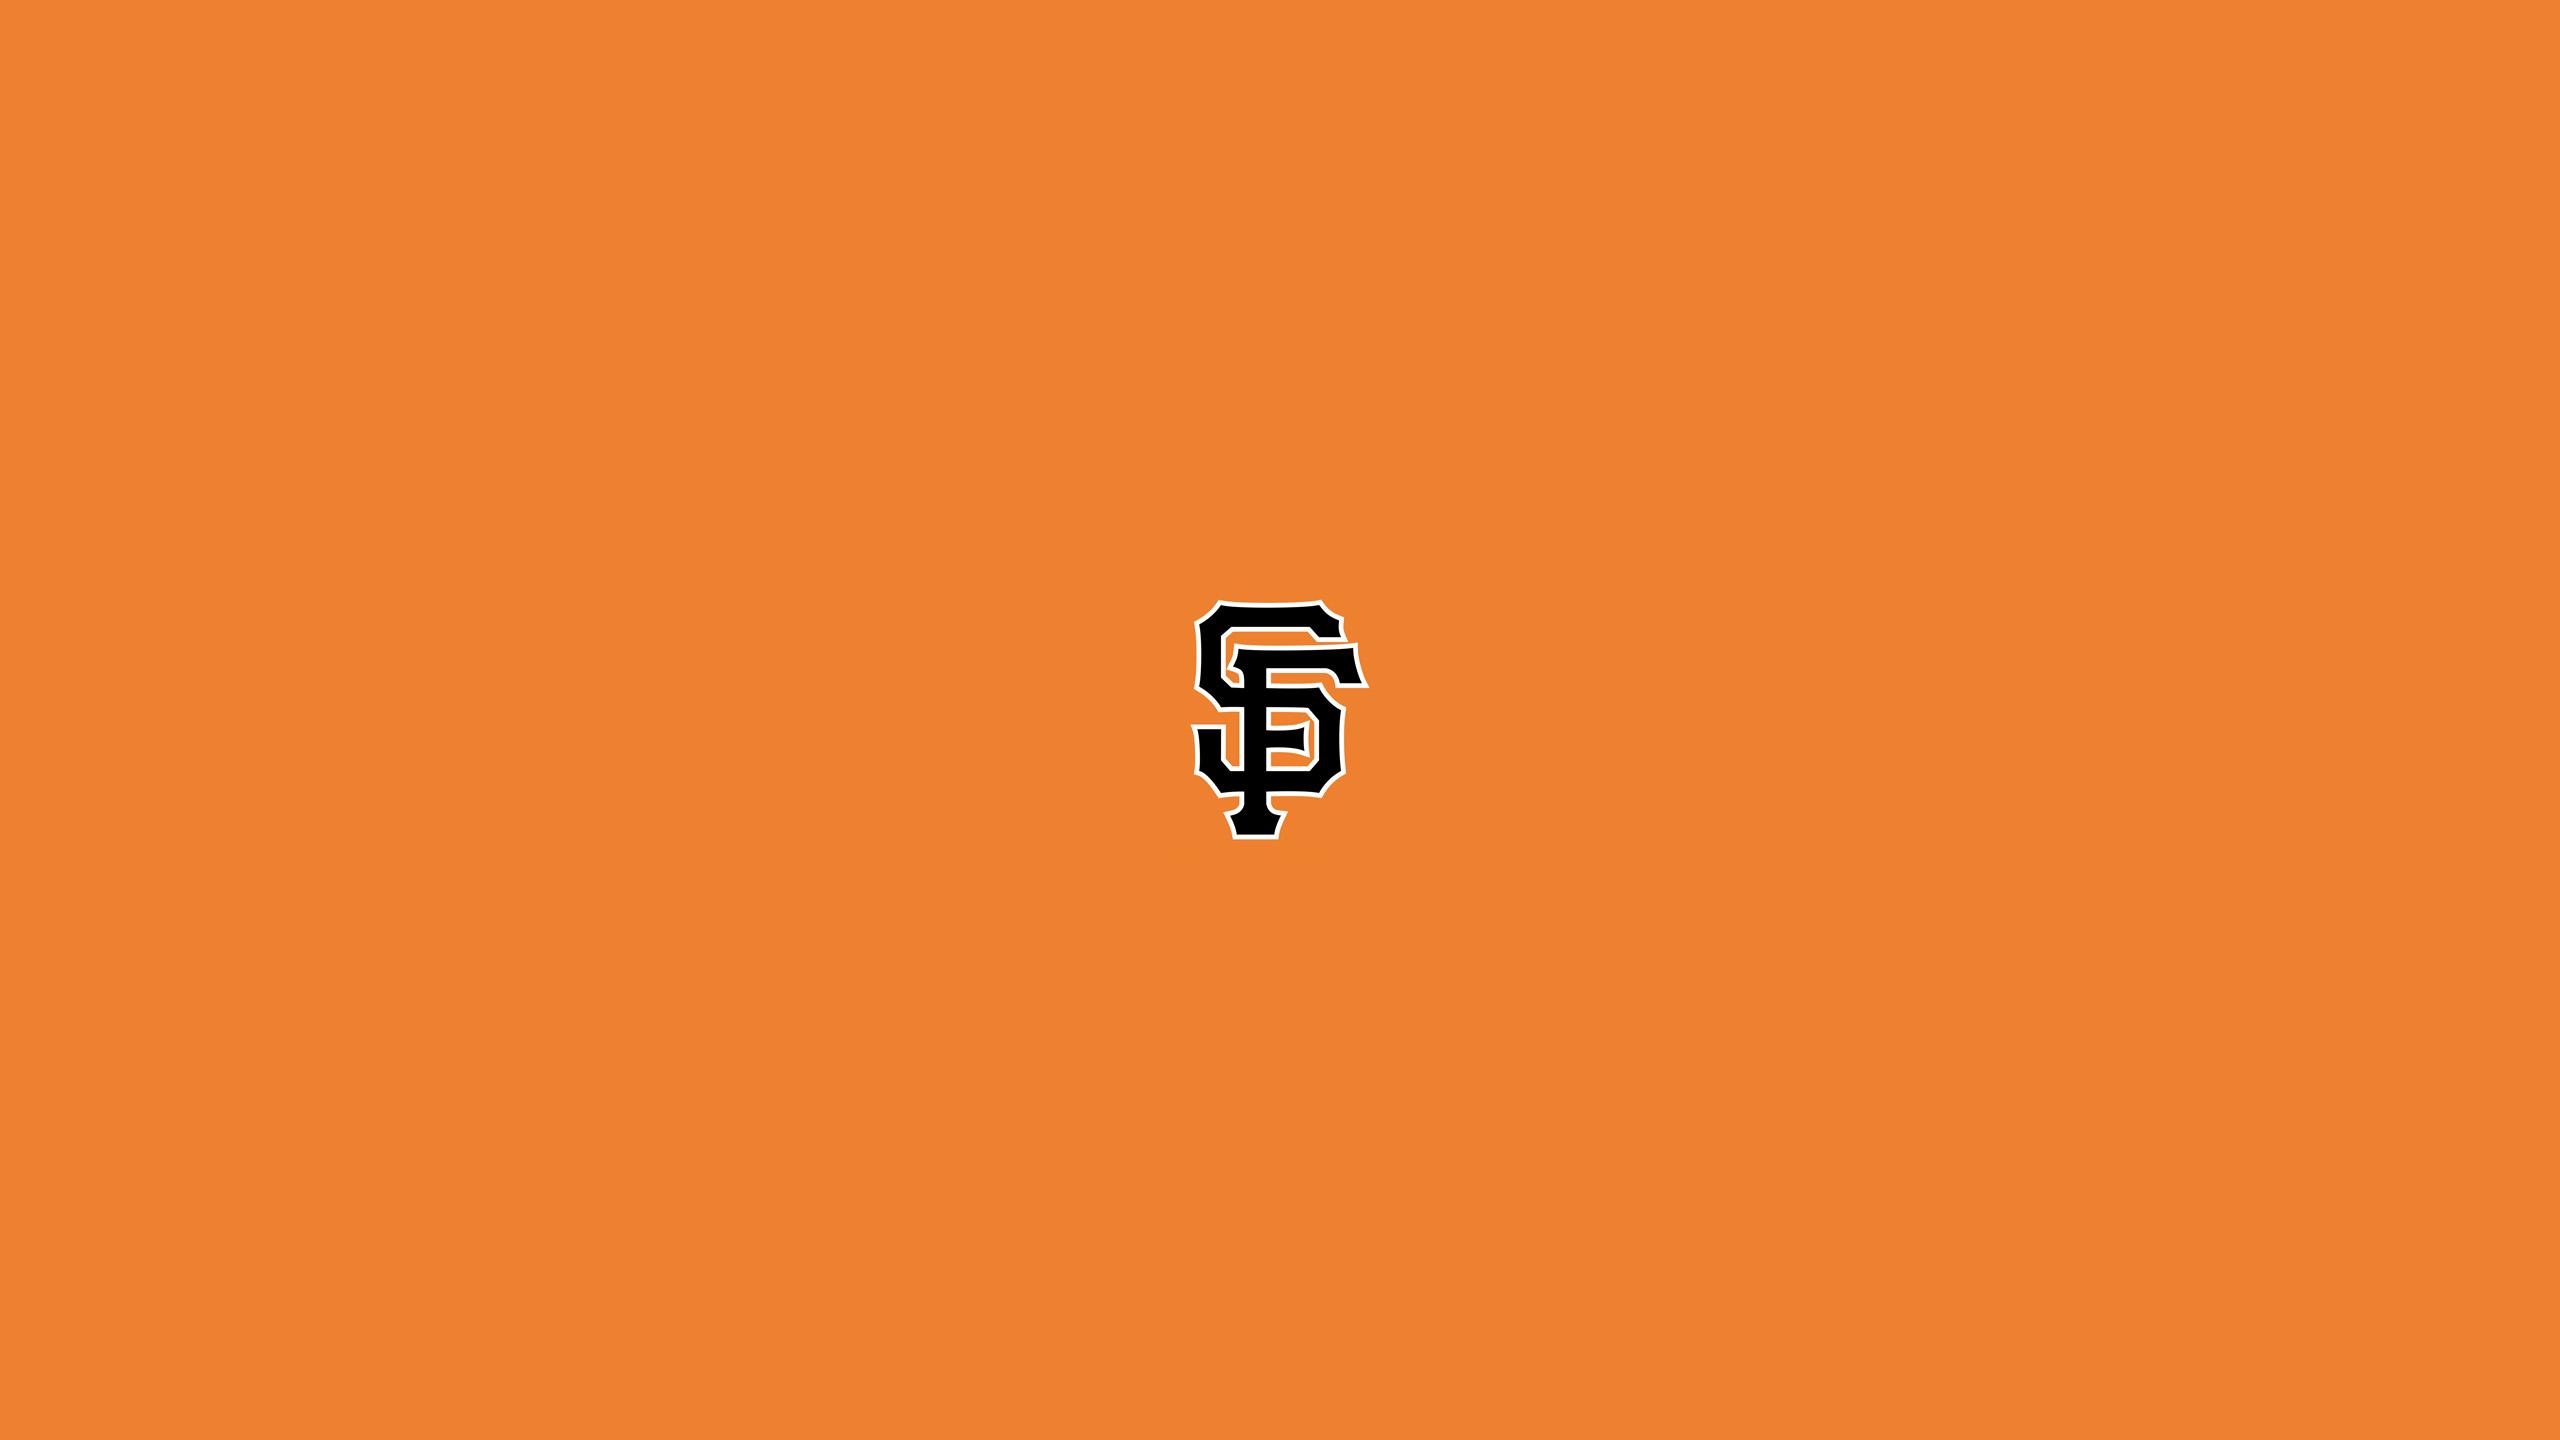 SAN FRANCISCO GIANTS Mlb Baseball (37) Wallpaper